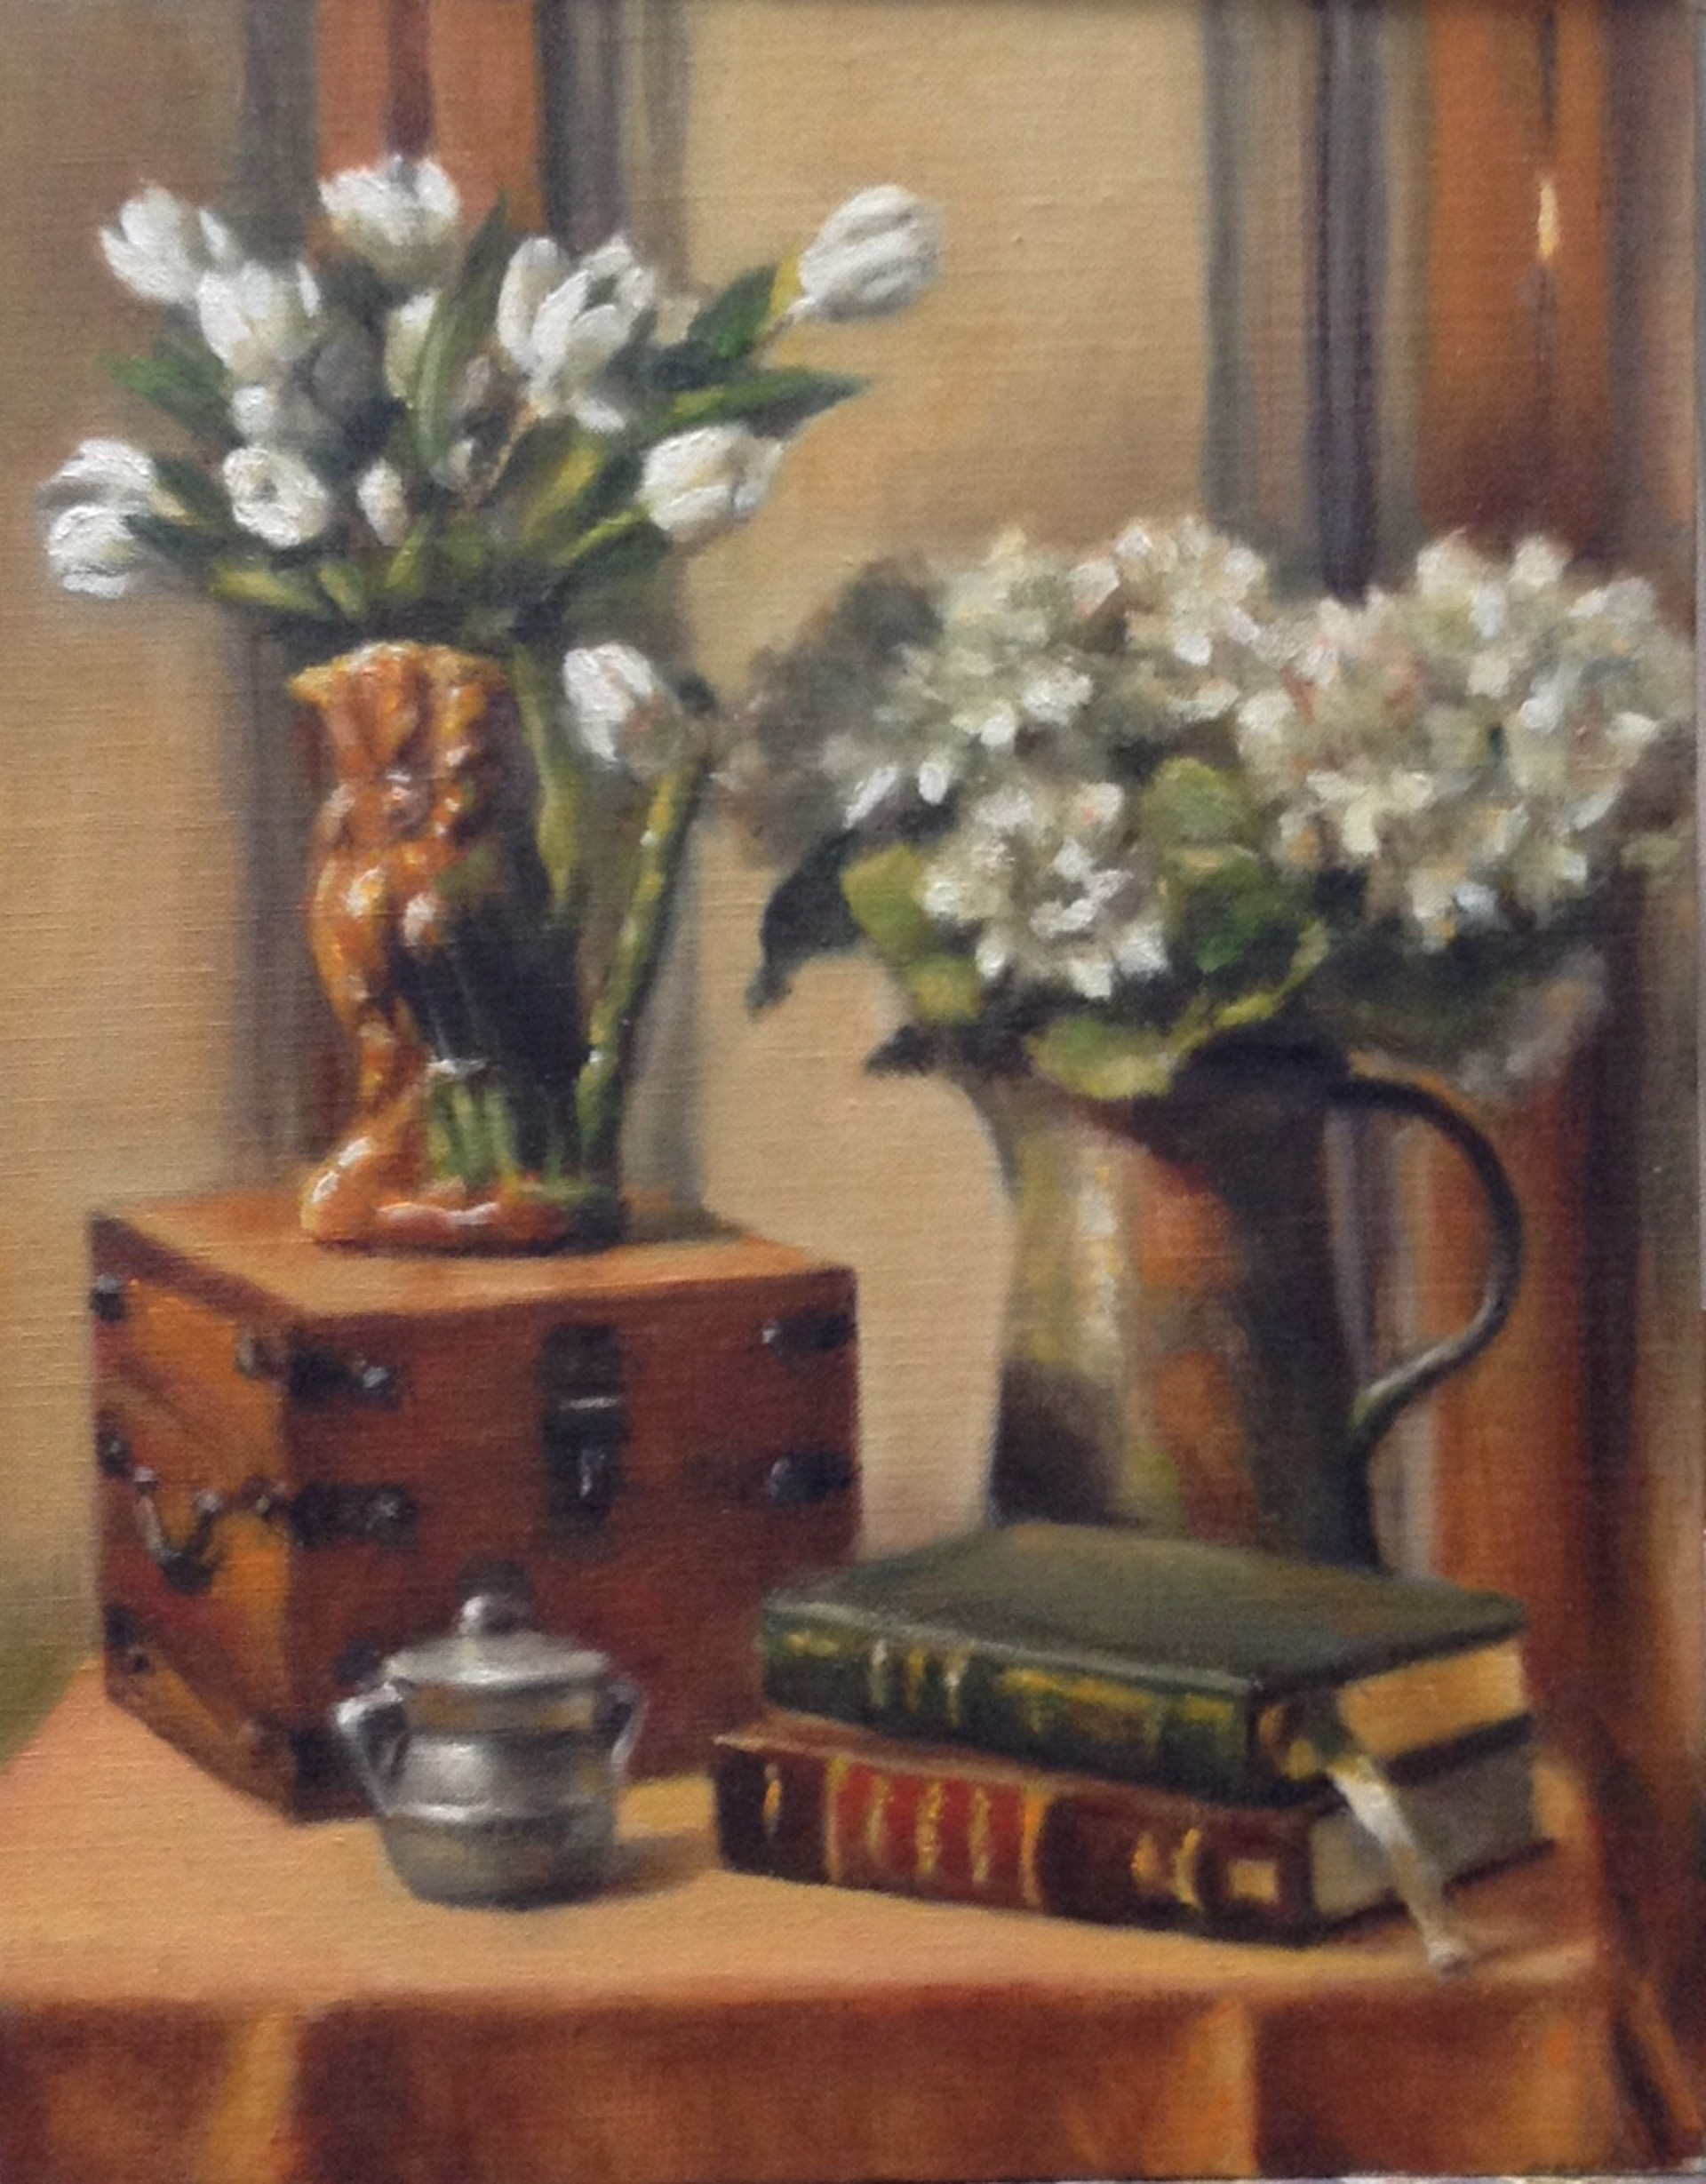 Studio Still-Life by Dominic Vignola